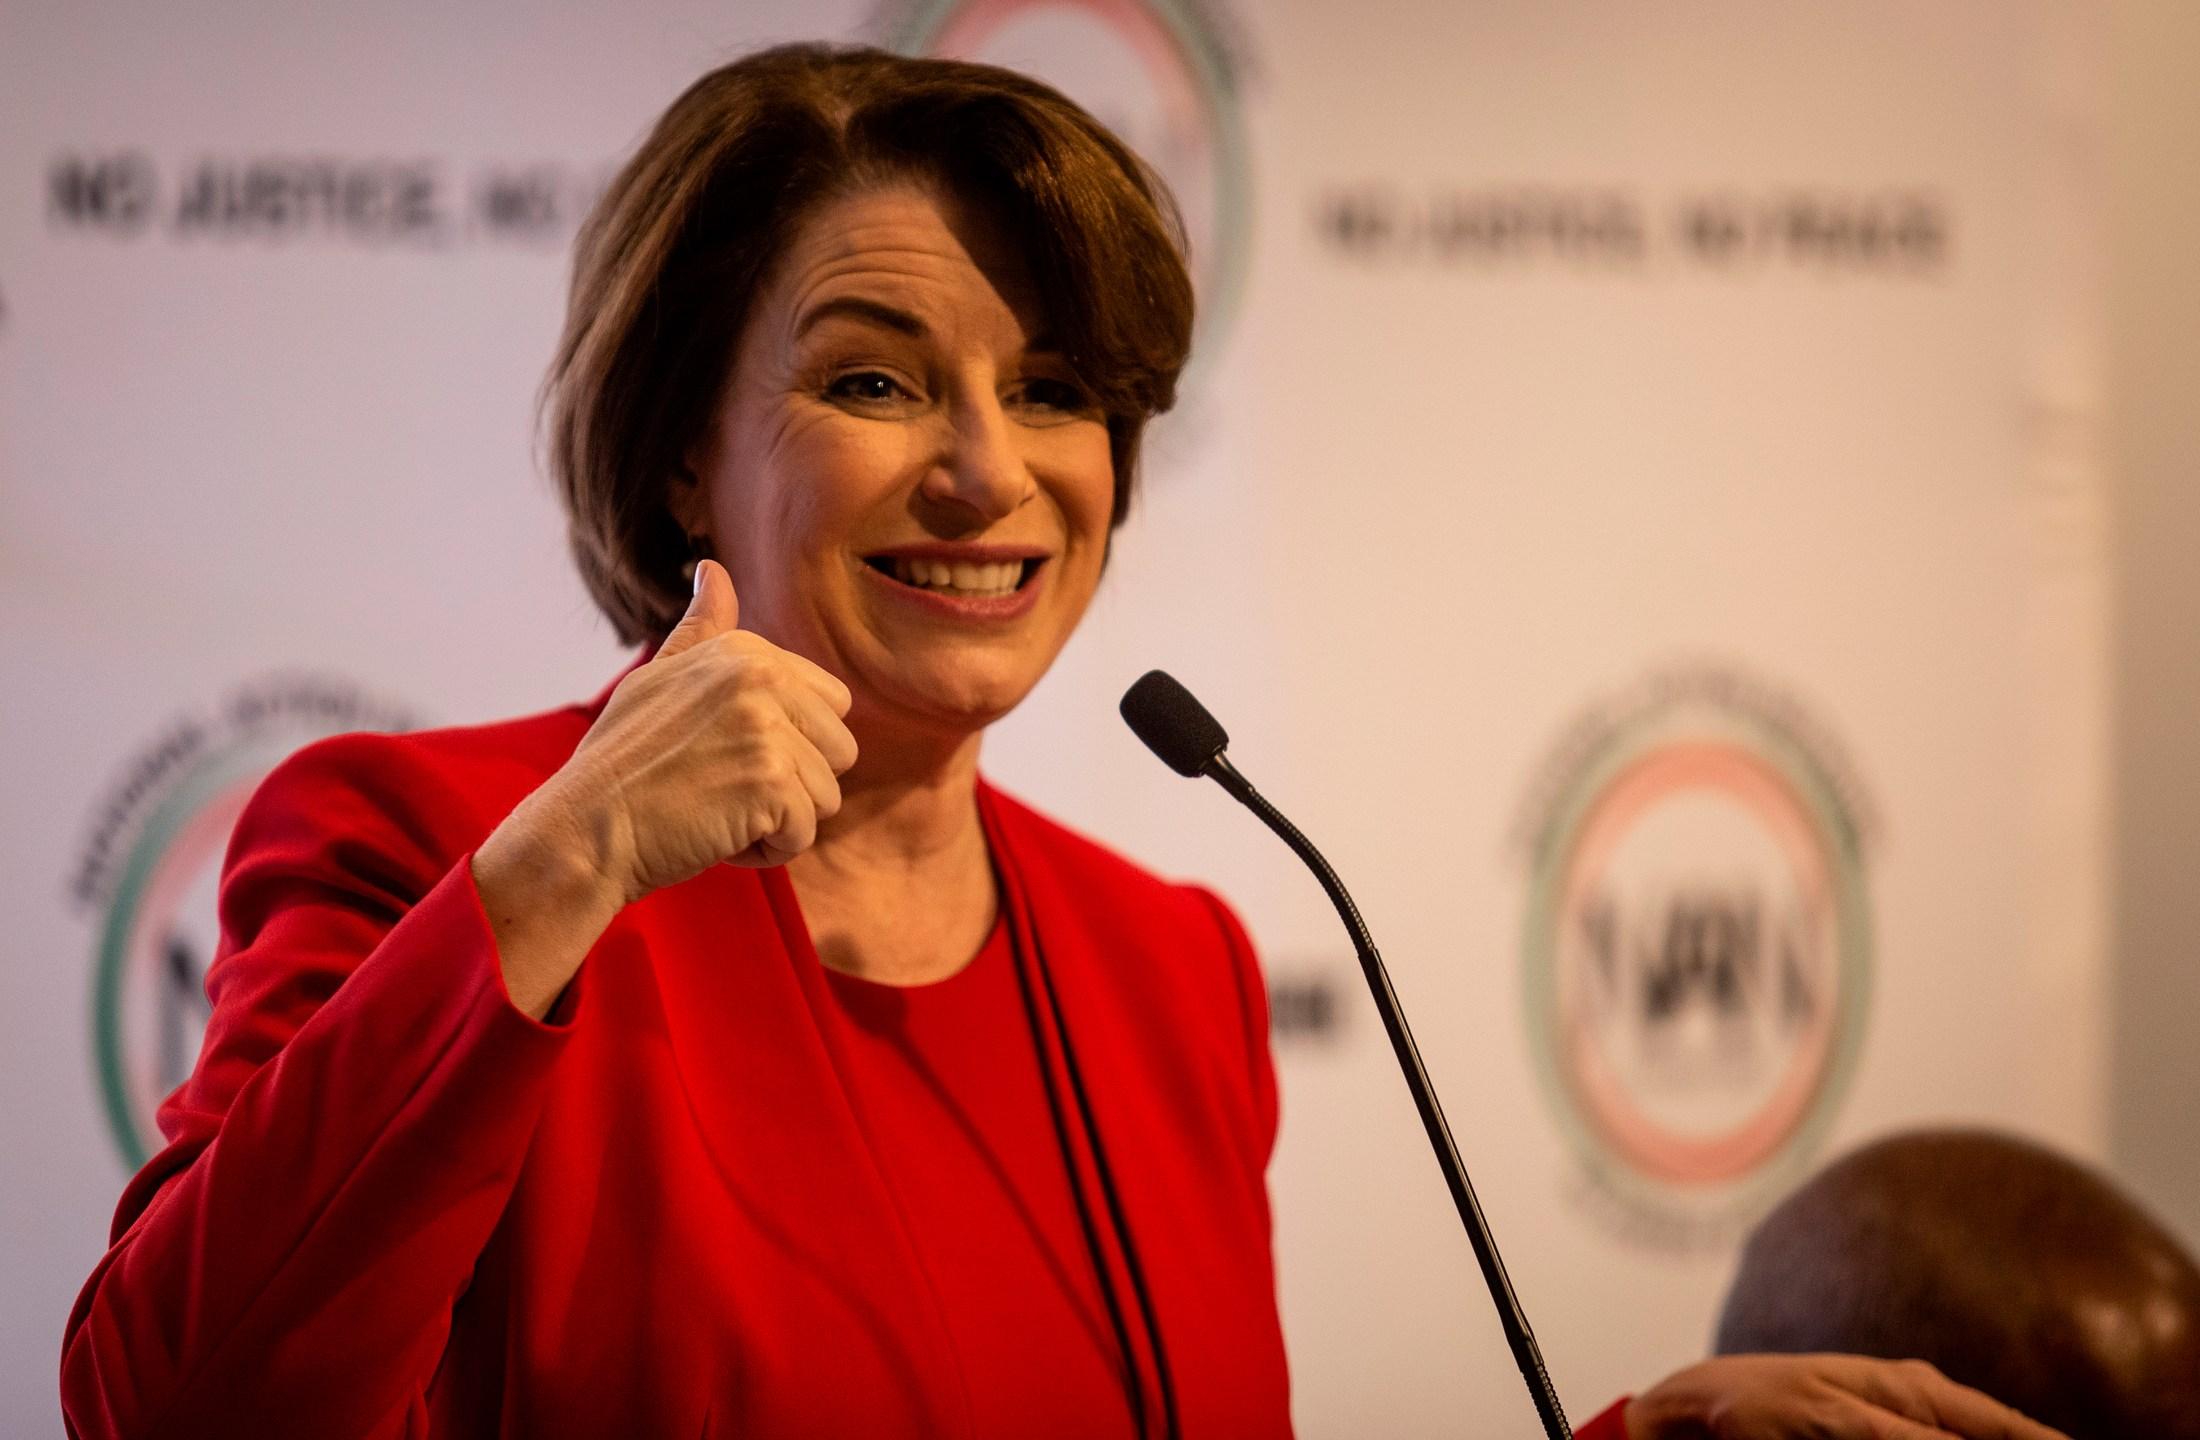 Amy Klobuchar, Klobuchar speaks at Sharpton event in Atlanta